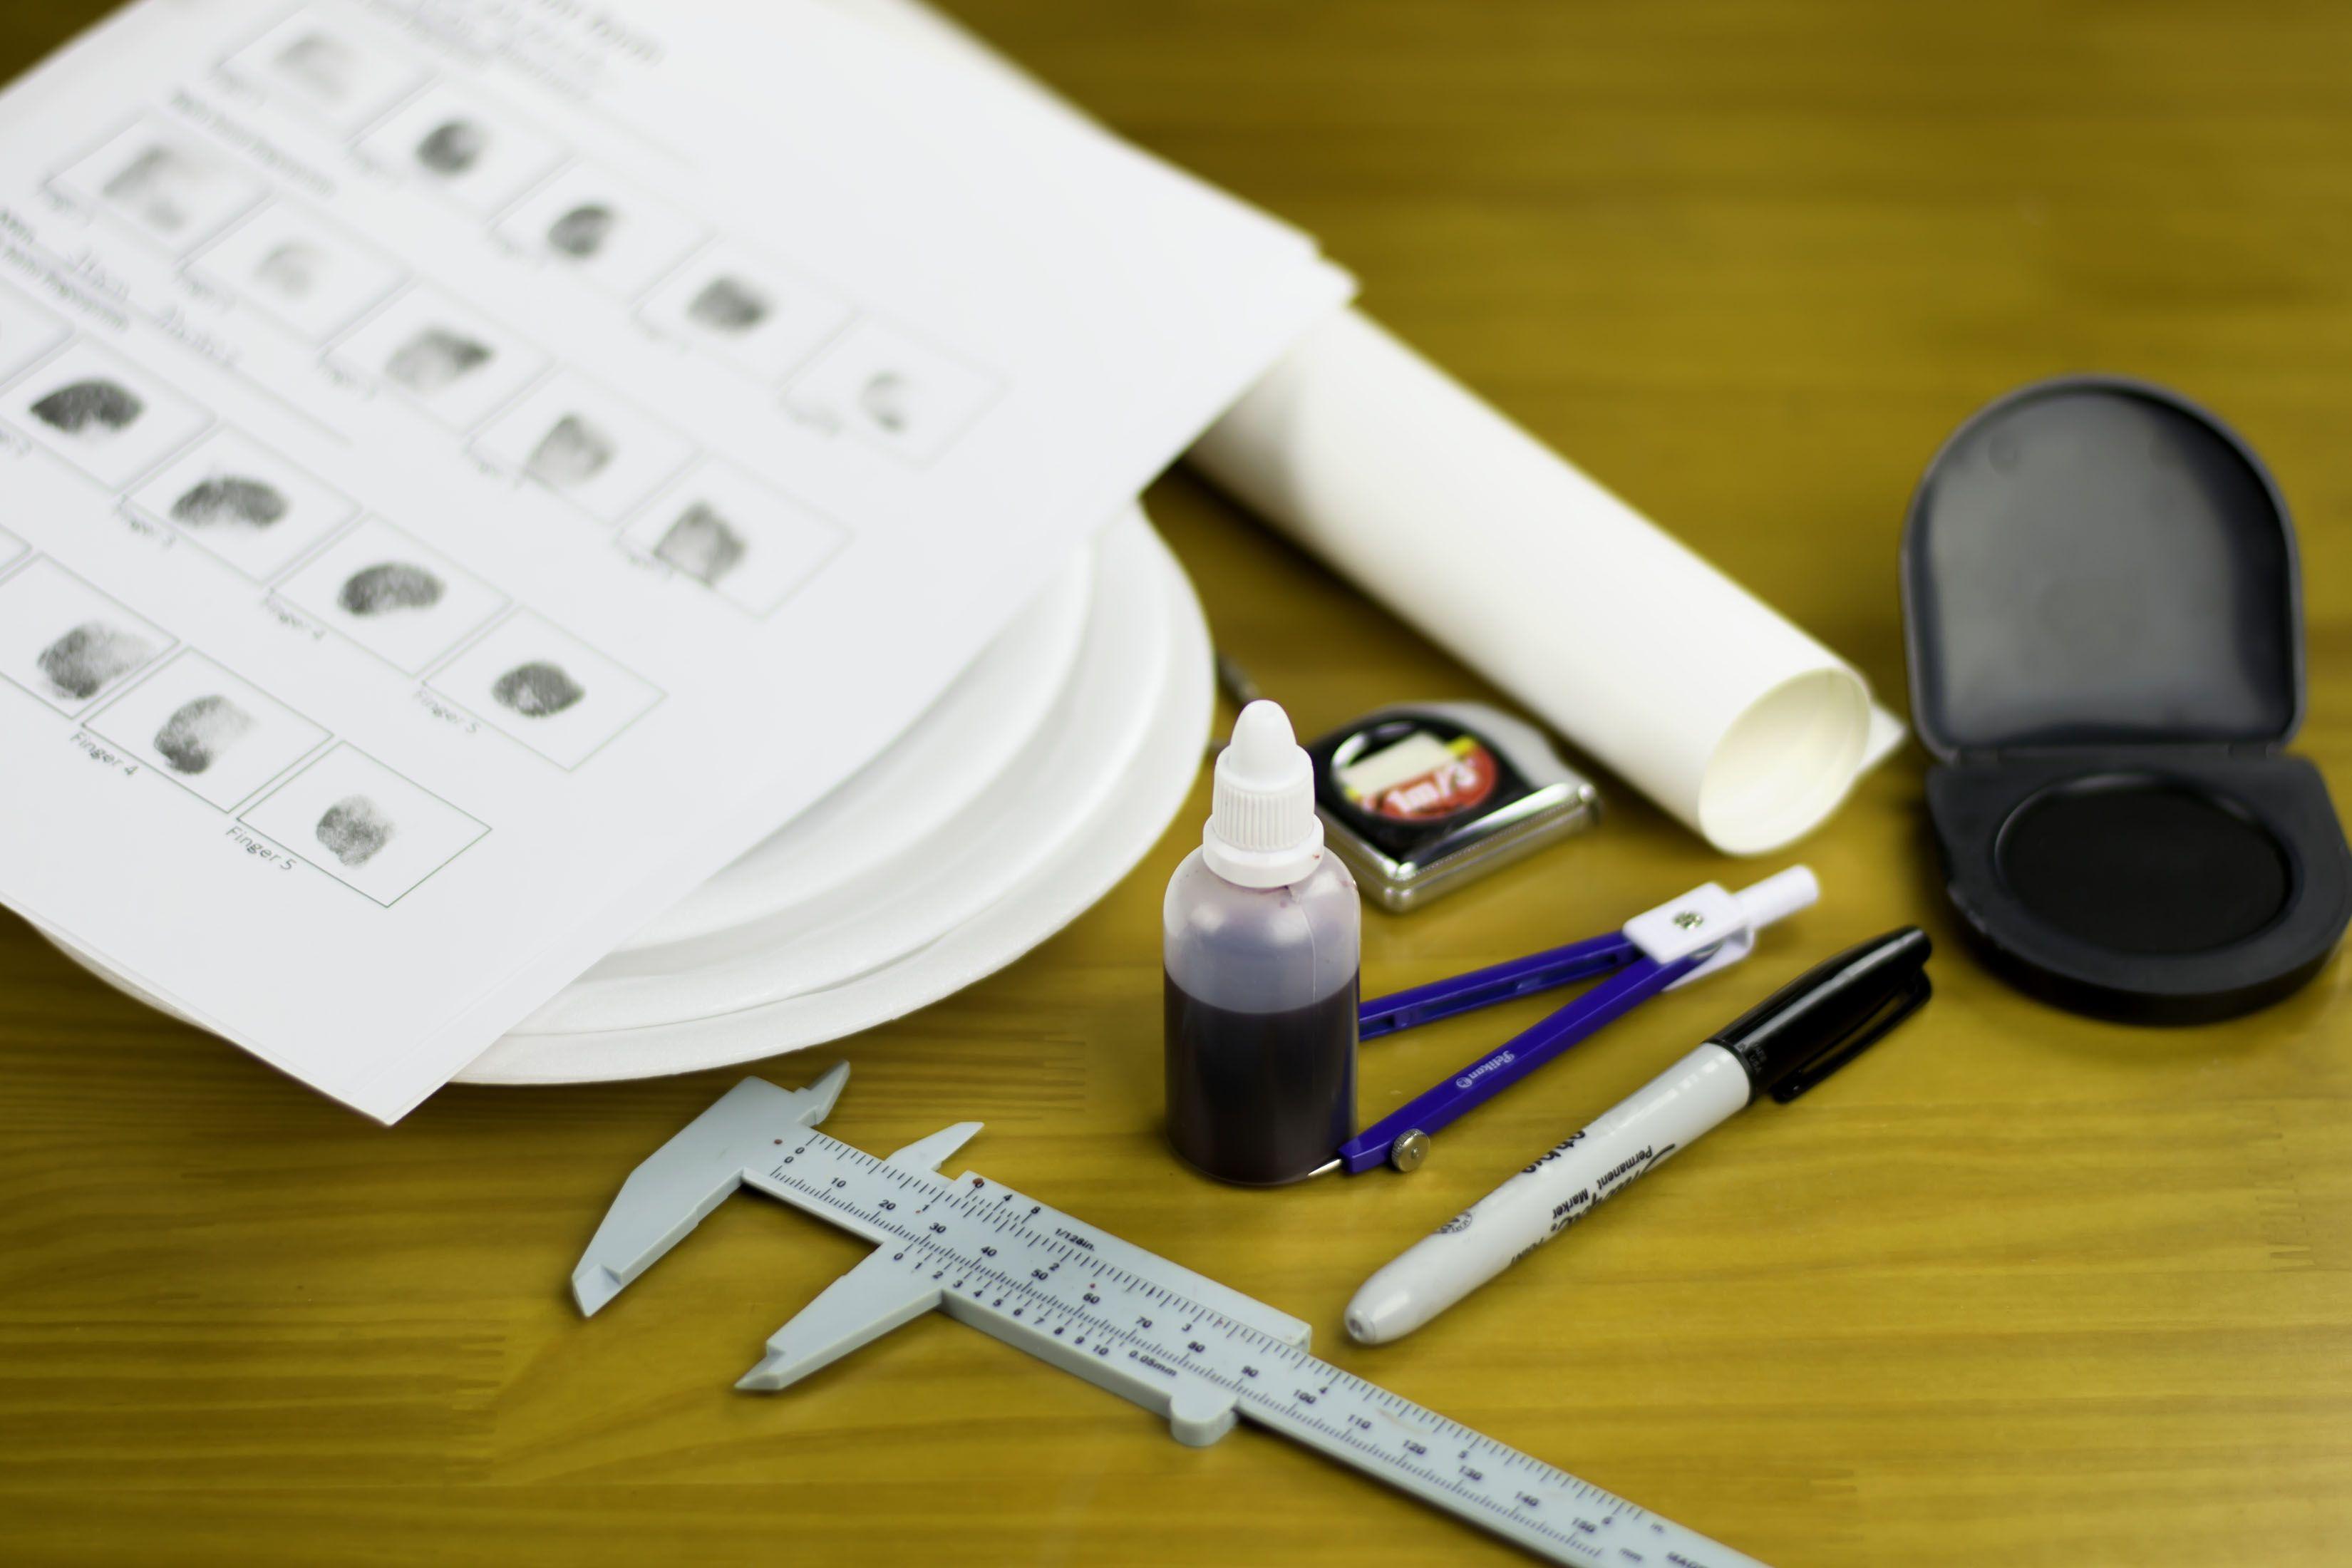 High School Forensics Science Fair Project Ideas